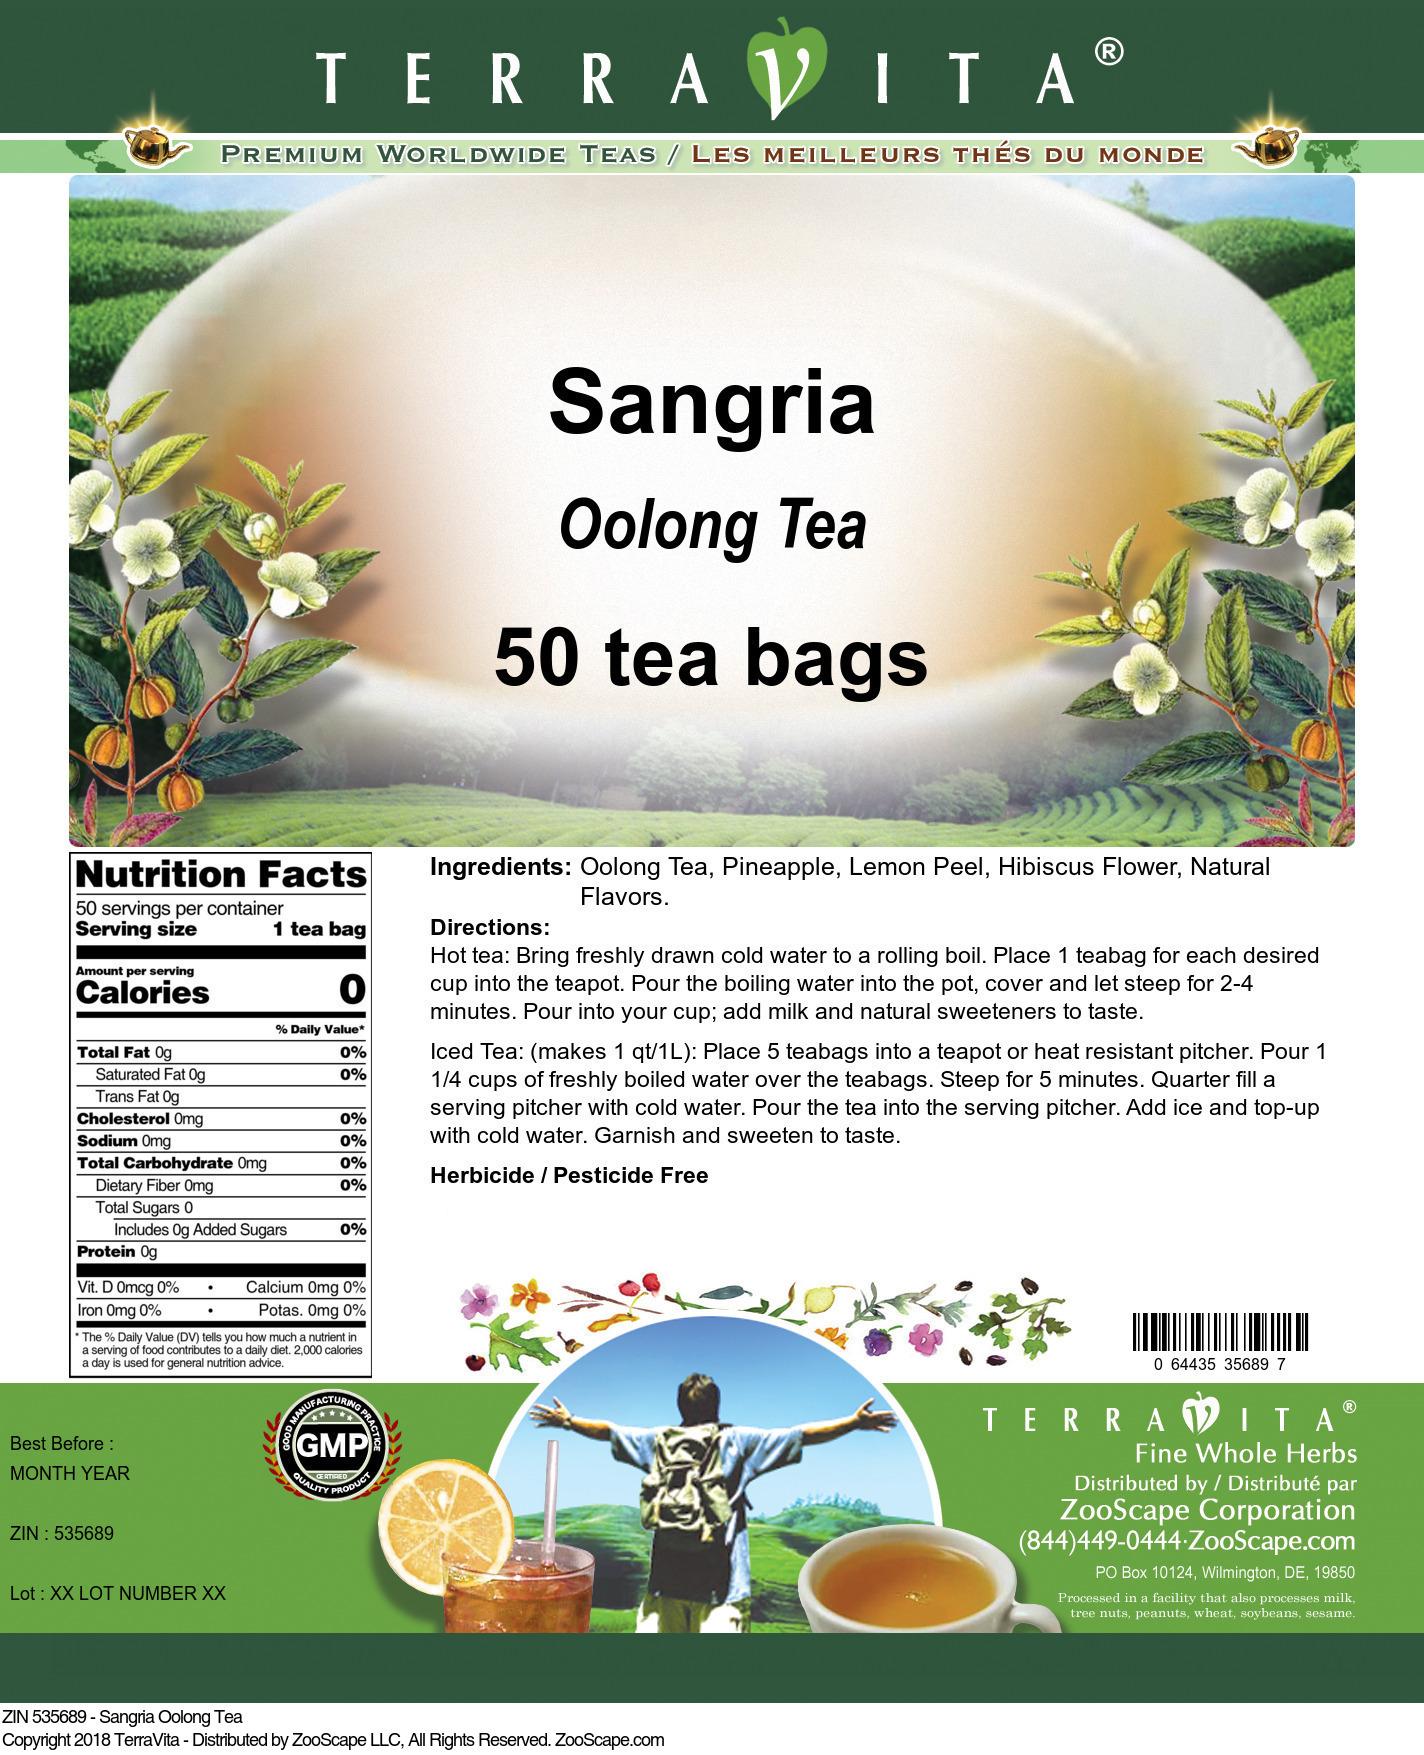 Sangria Oolong Tea